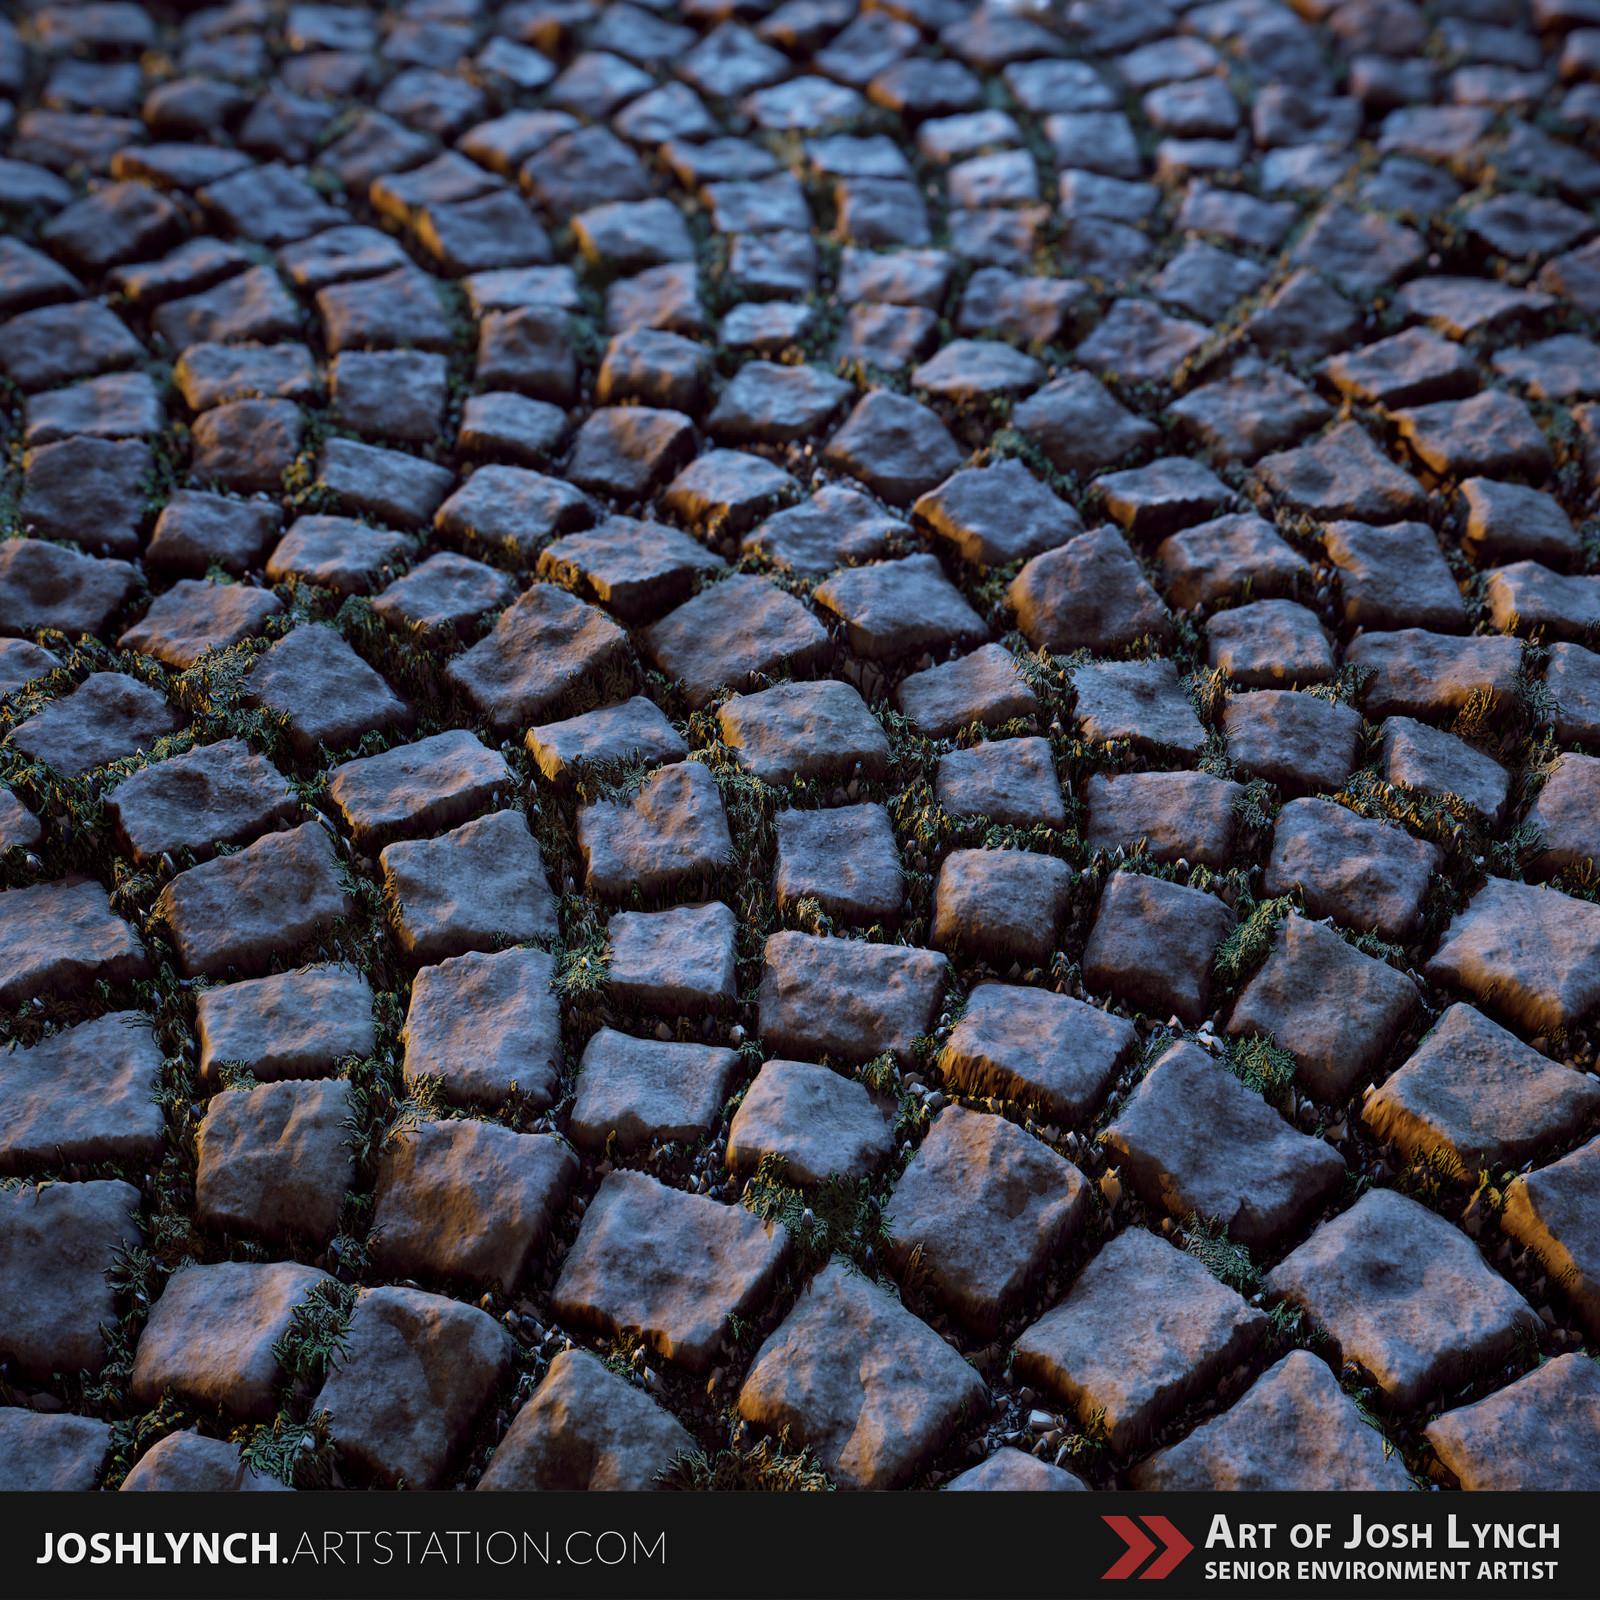 Joshua lynch cobblestone street 03 layout comp square ground 03